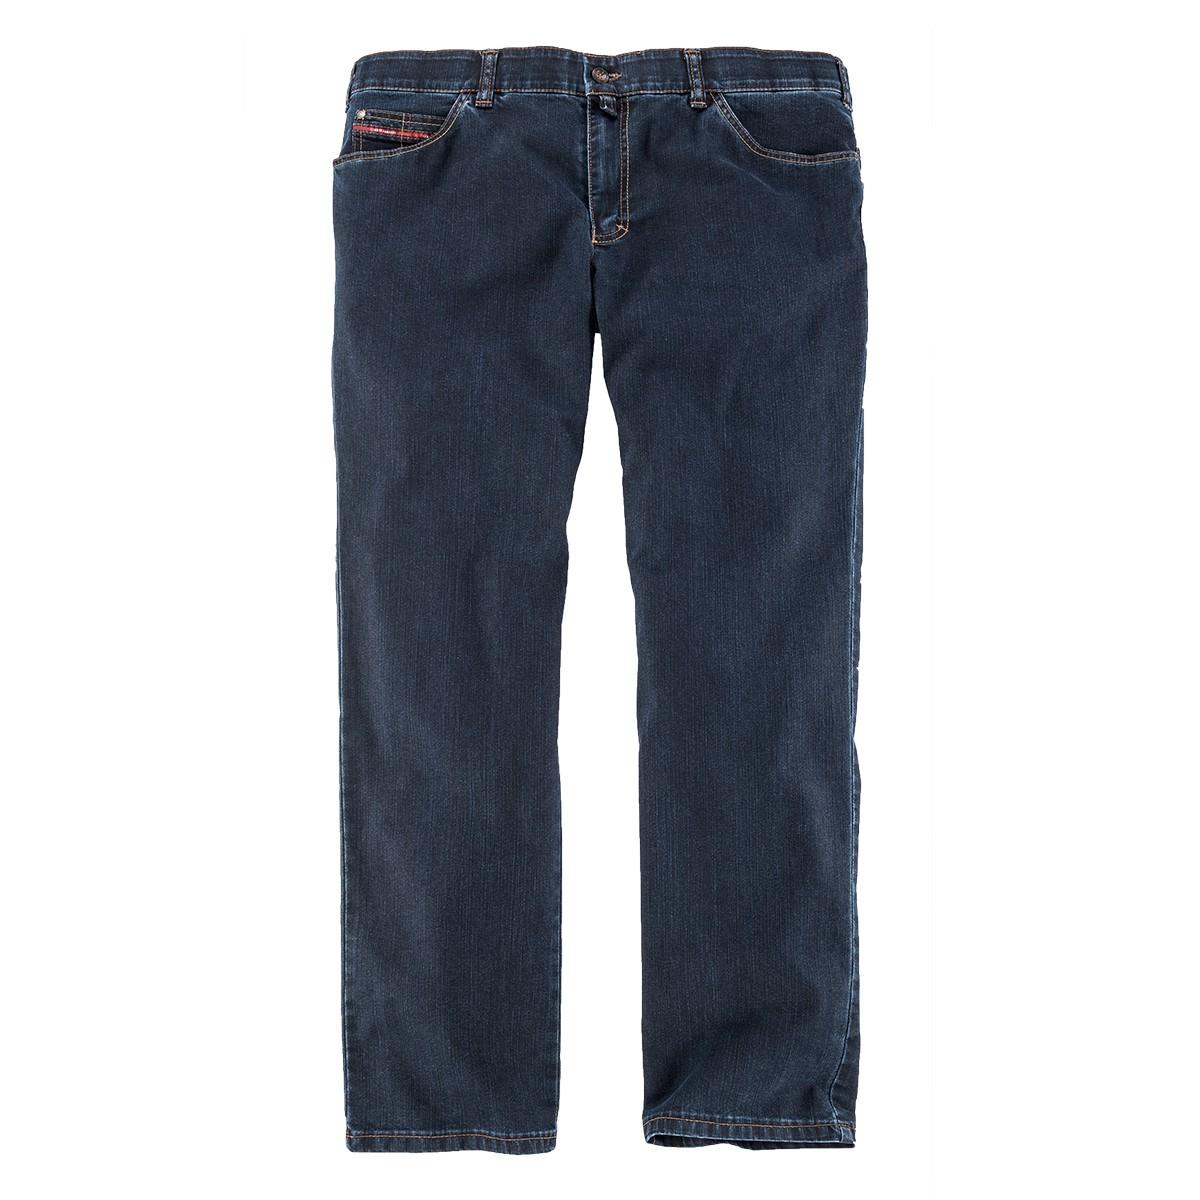 club of comfort dunkelblaue jeans liam bergr e. Black Bedroom Furniture Sets. Home Design Ideas